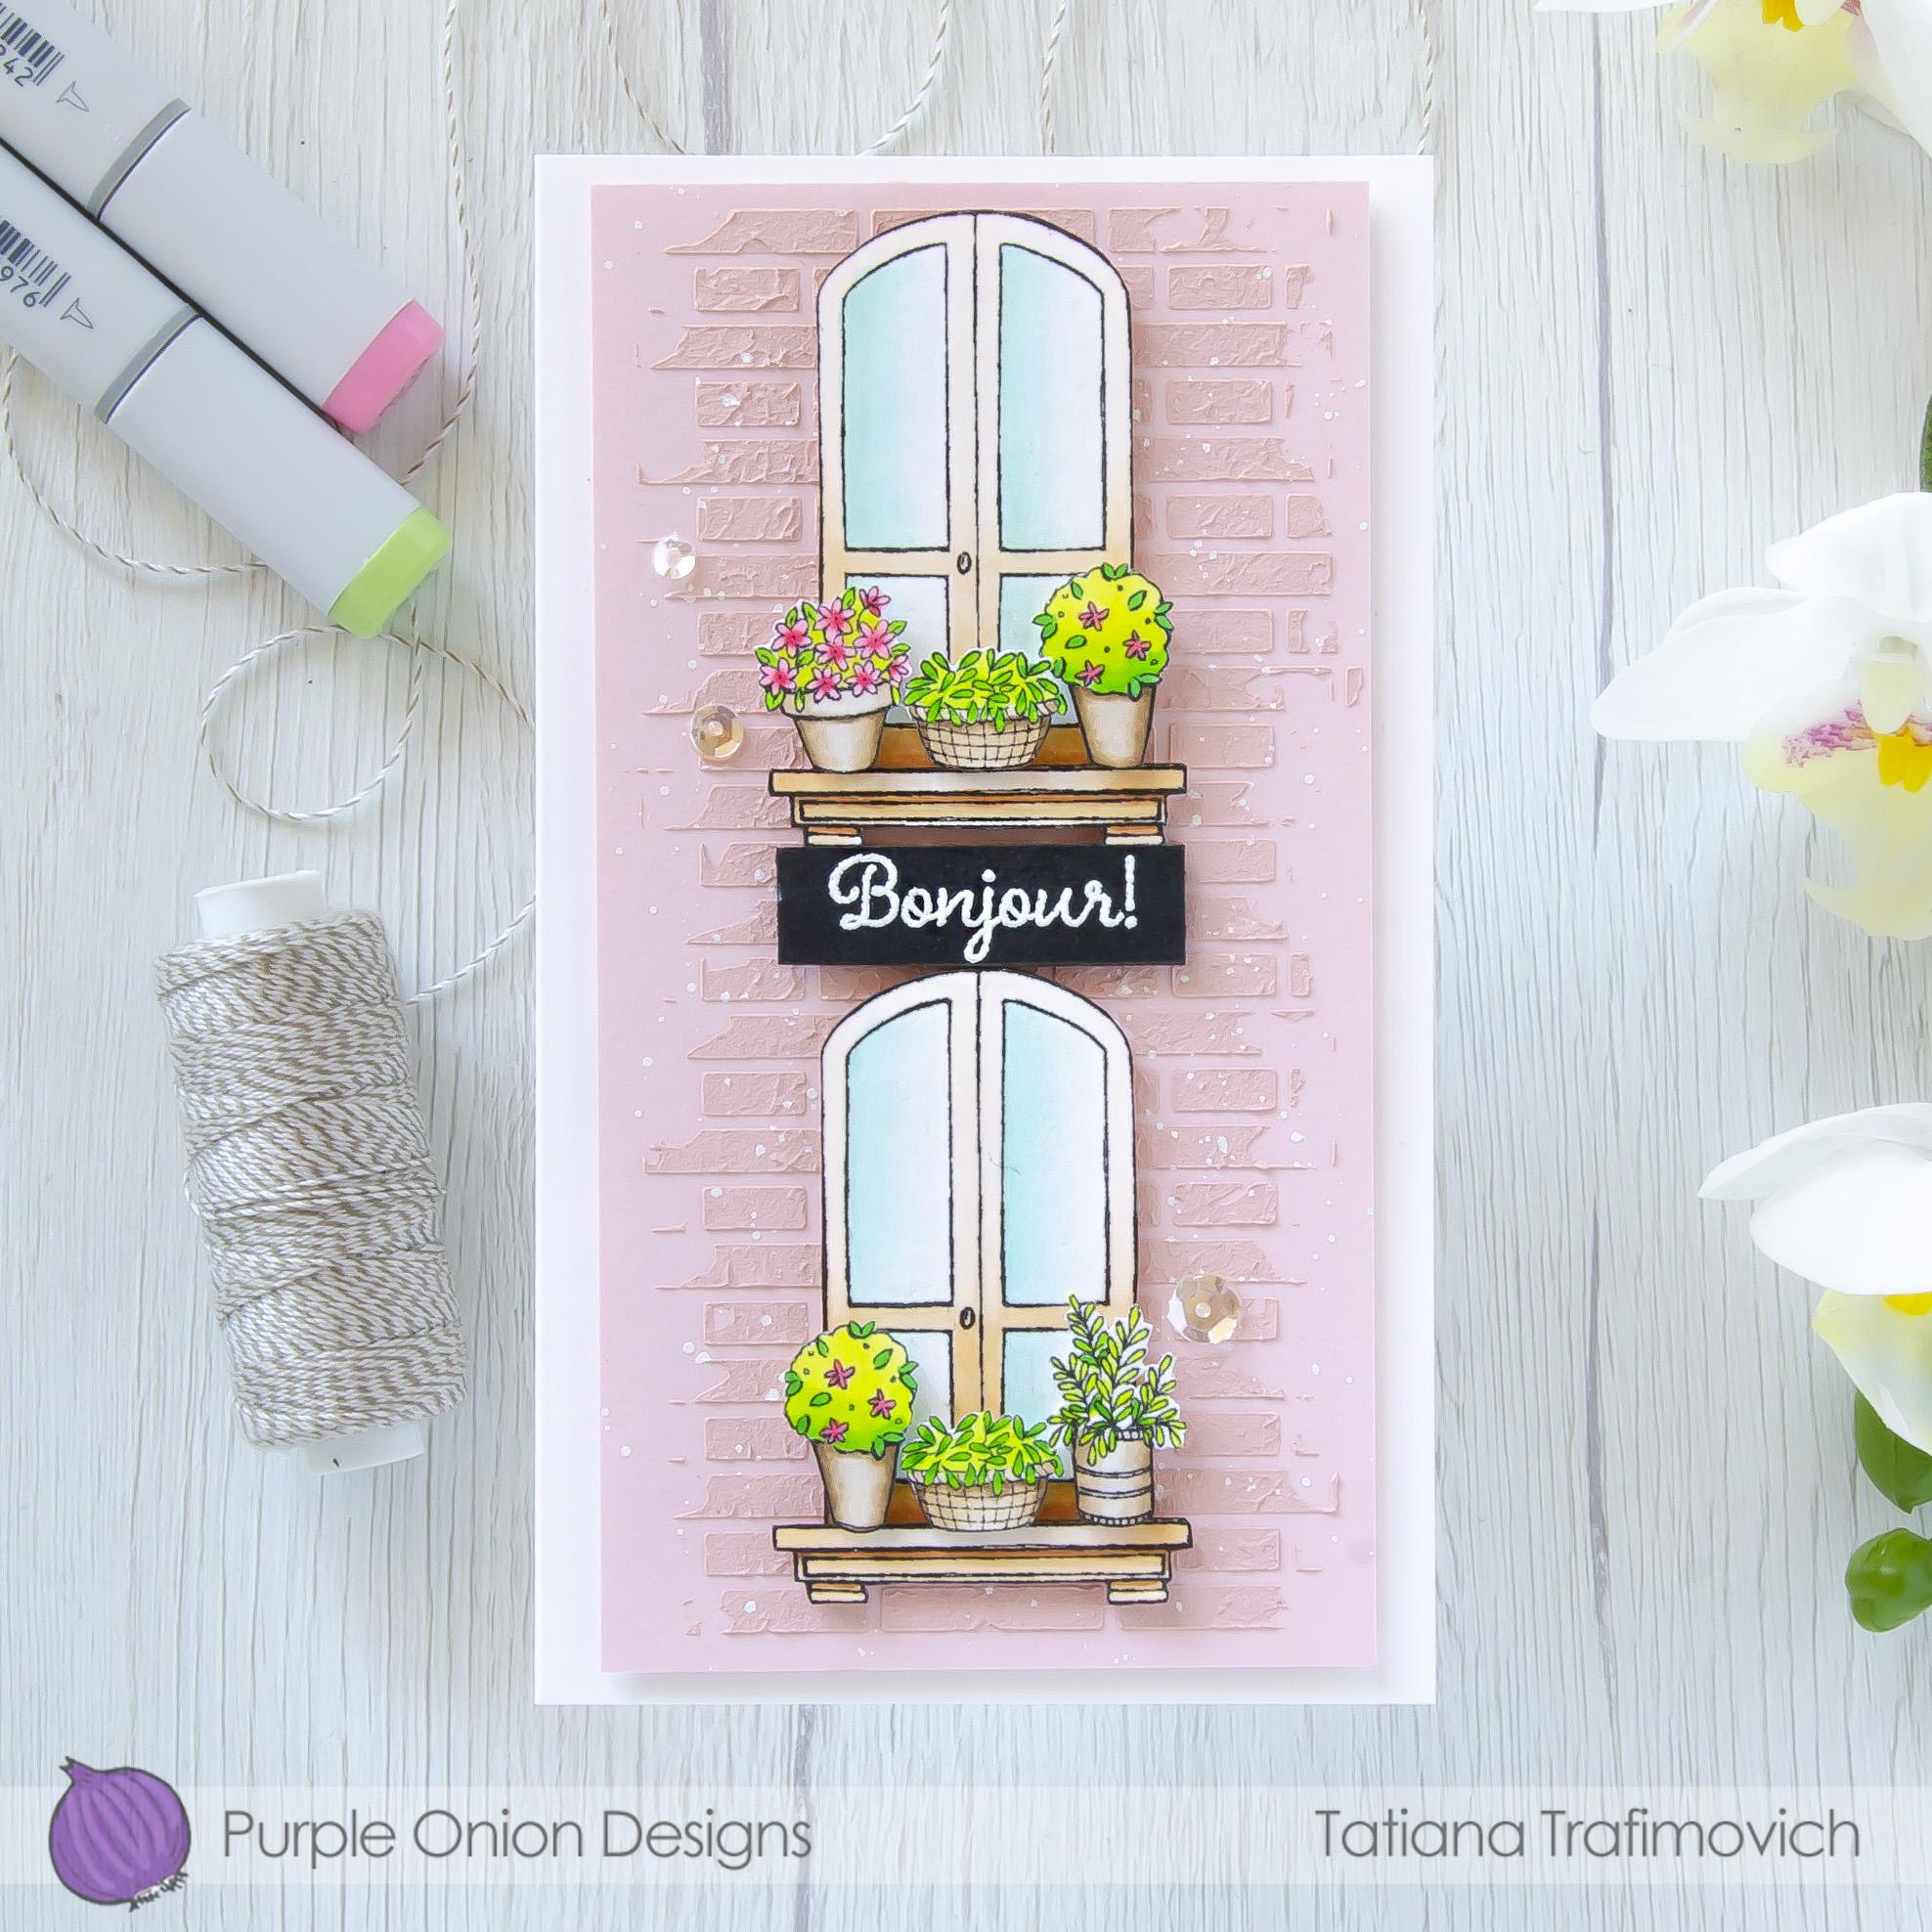 Bonjour #handmade card by Tatiana Trafimovich #tatianacraftandart - stamps by Purple Onion Designs